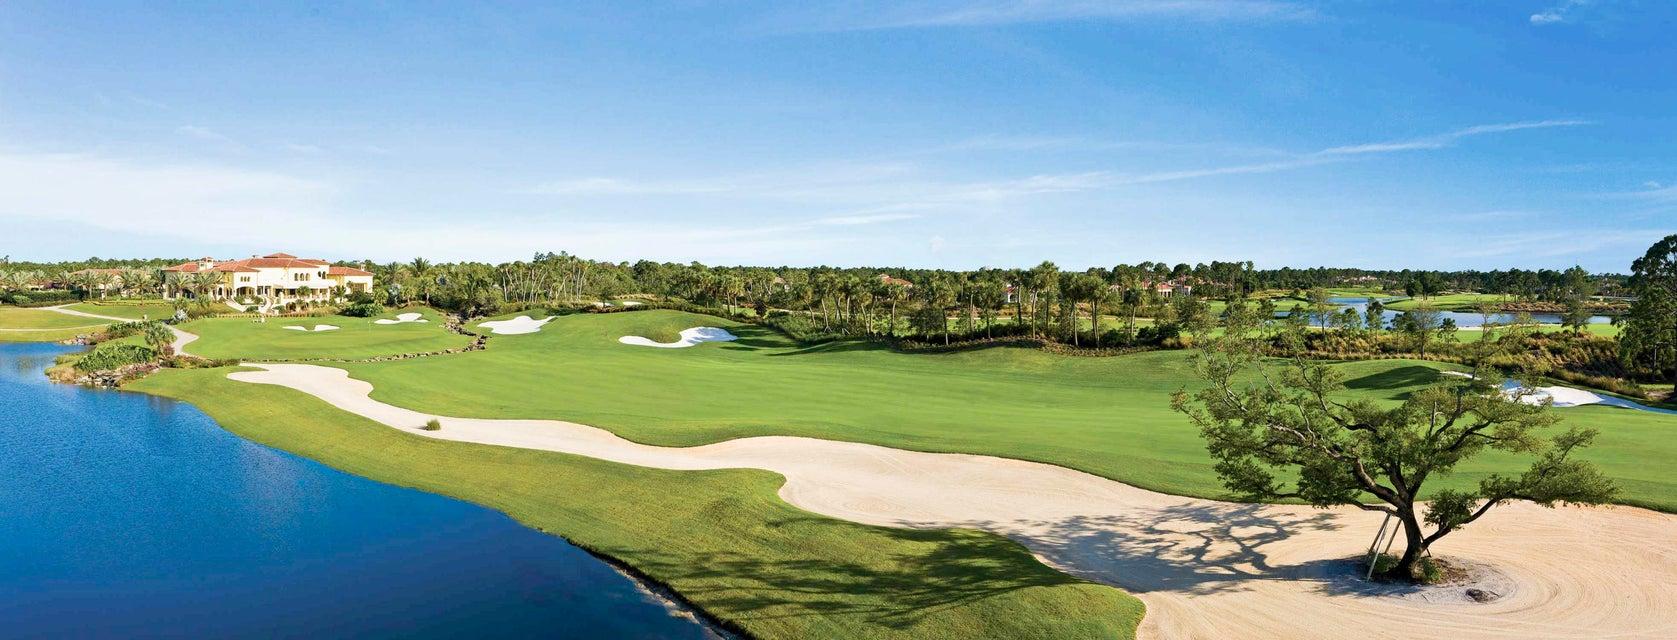 11515 Green Bayberry Drive, Palm Beach Gardens, FL, 33418 - SOLD ...